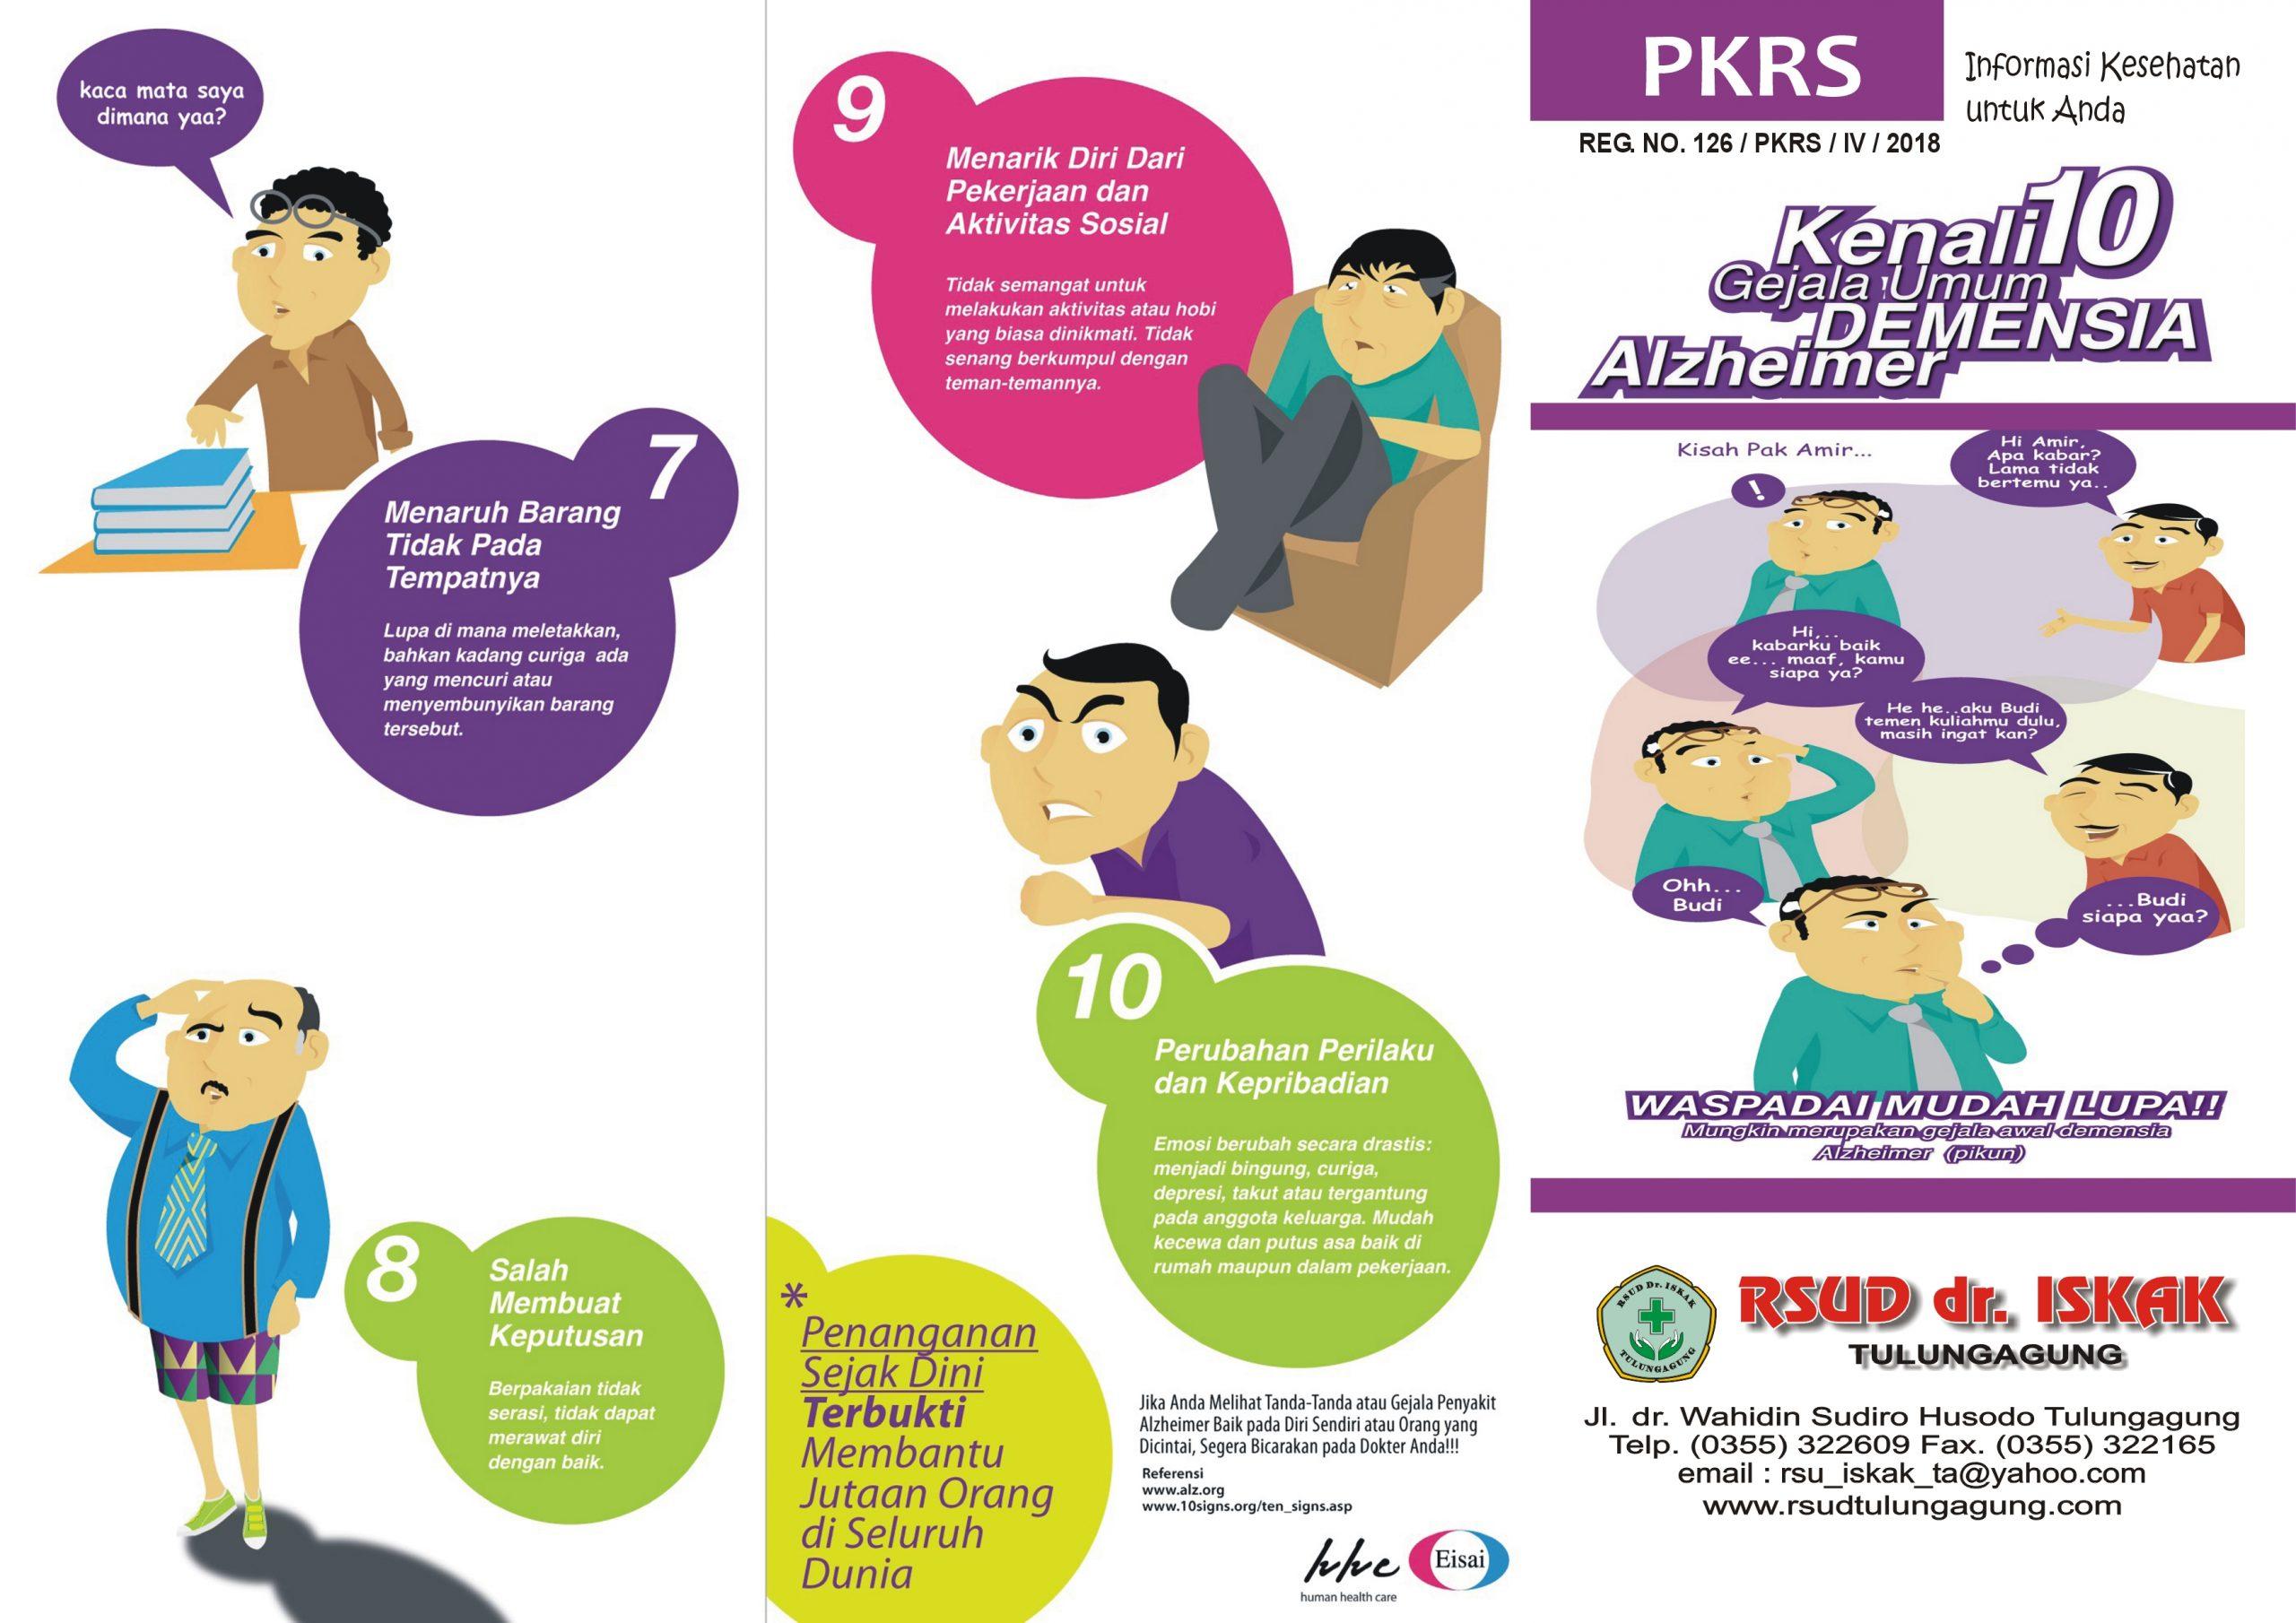 kenali 10 gejala umum demensia alzheimer